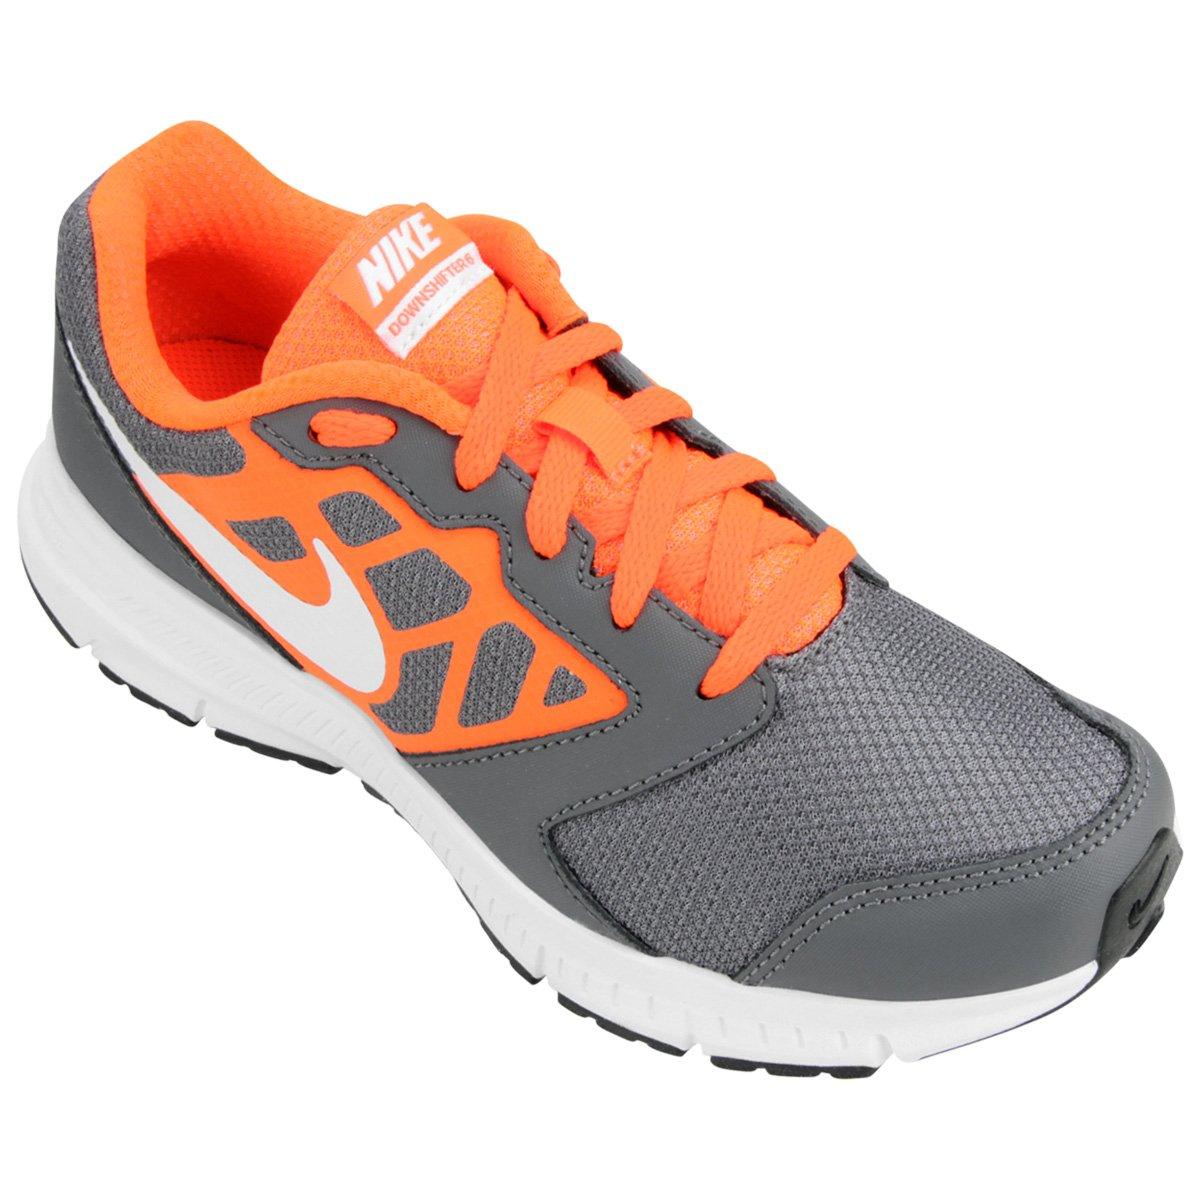 683565fe71 Tênis Nike Downshifter 6 Juvenil - Compre Agora